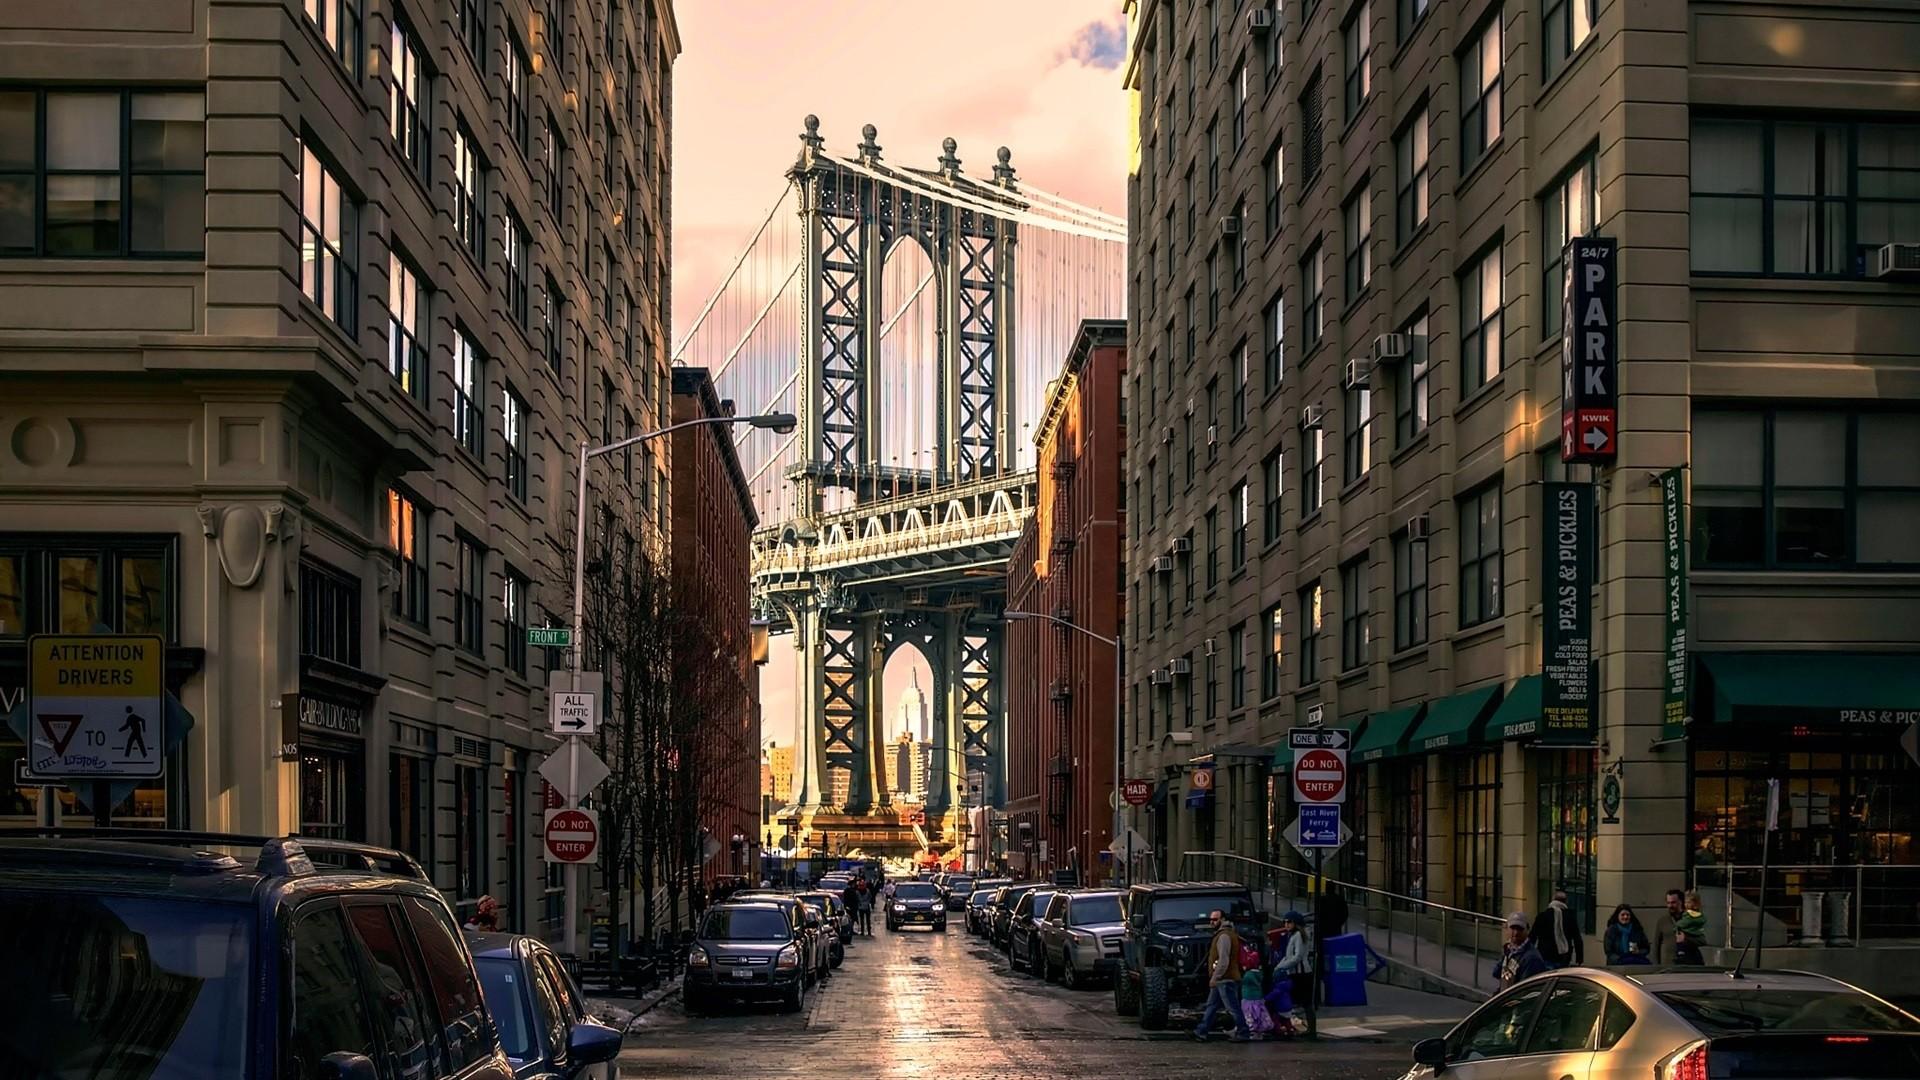 New York Street Image